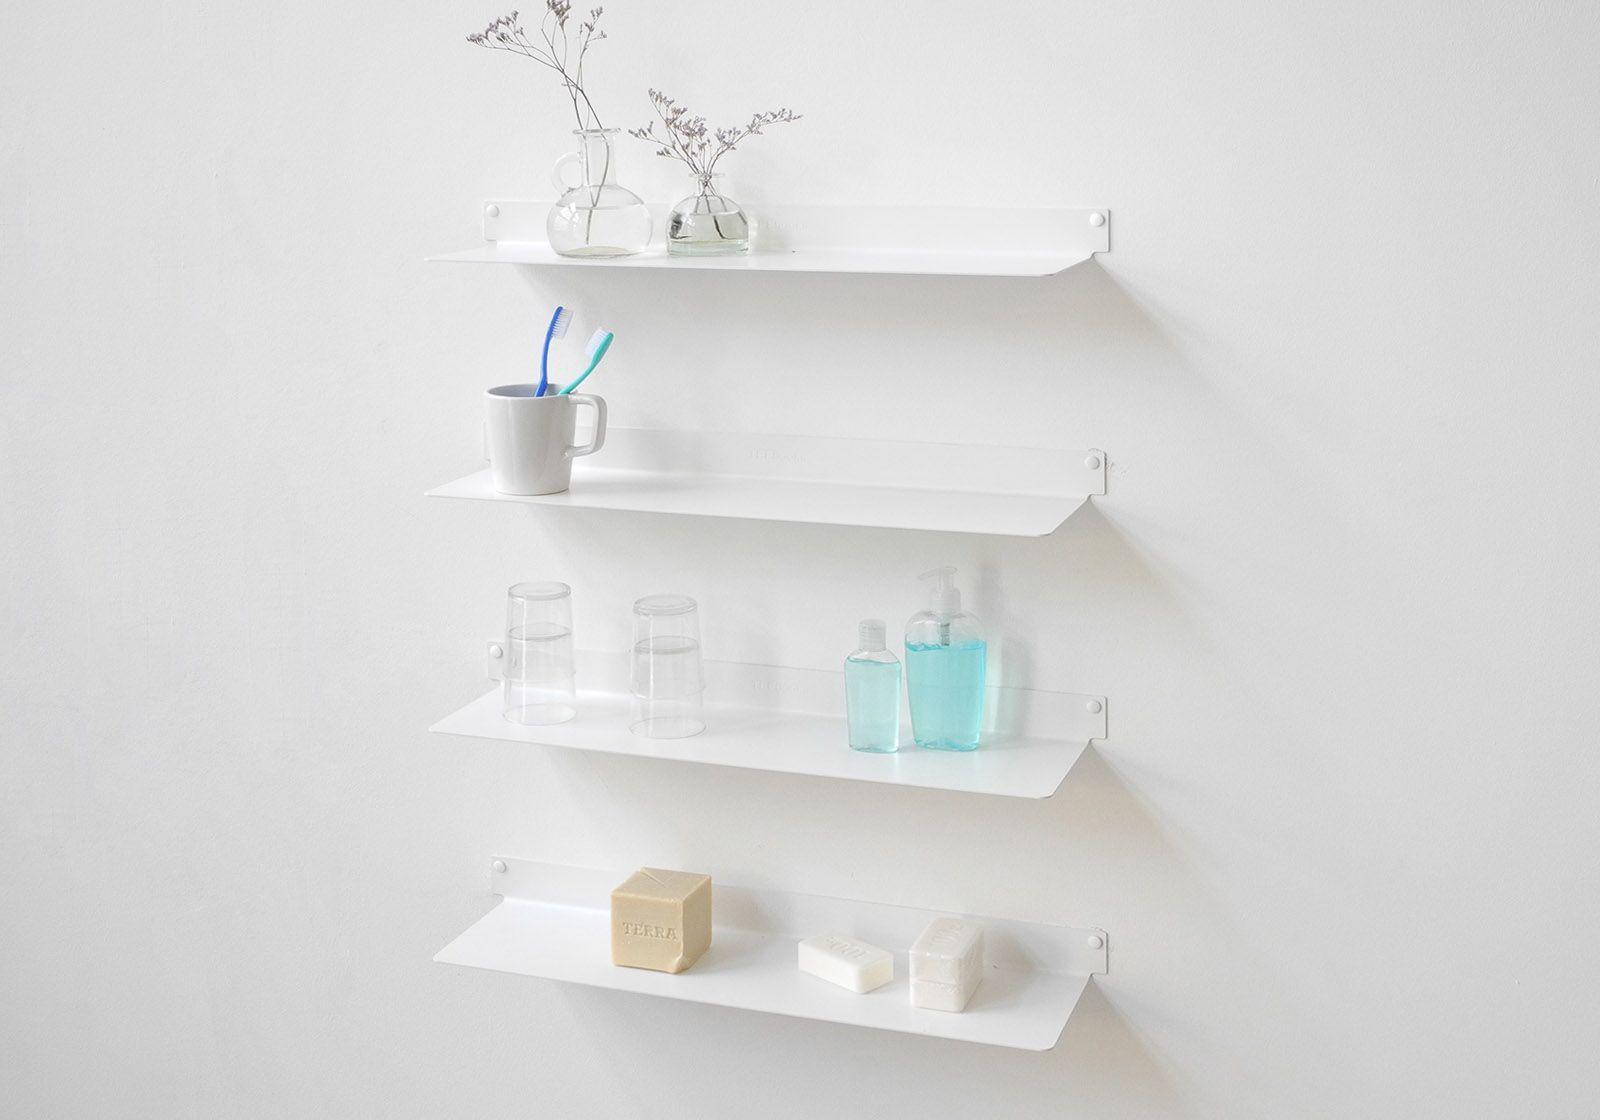 TEEline 6015 Bathroom shelves  - Set of 4